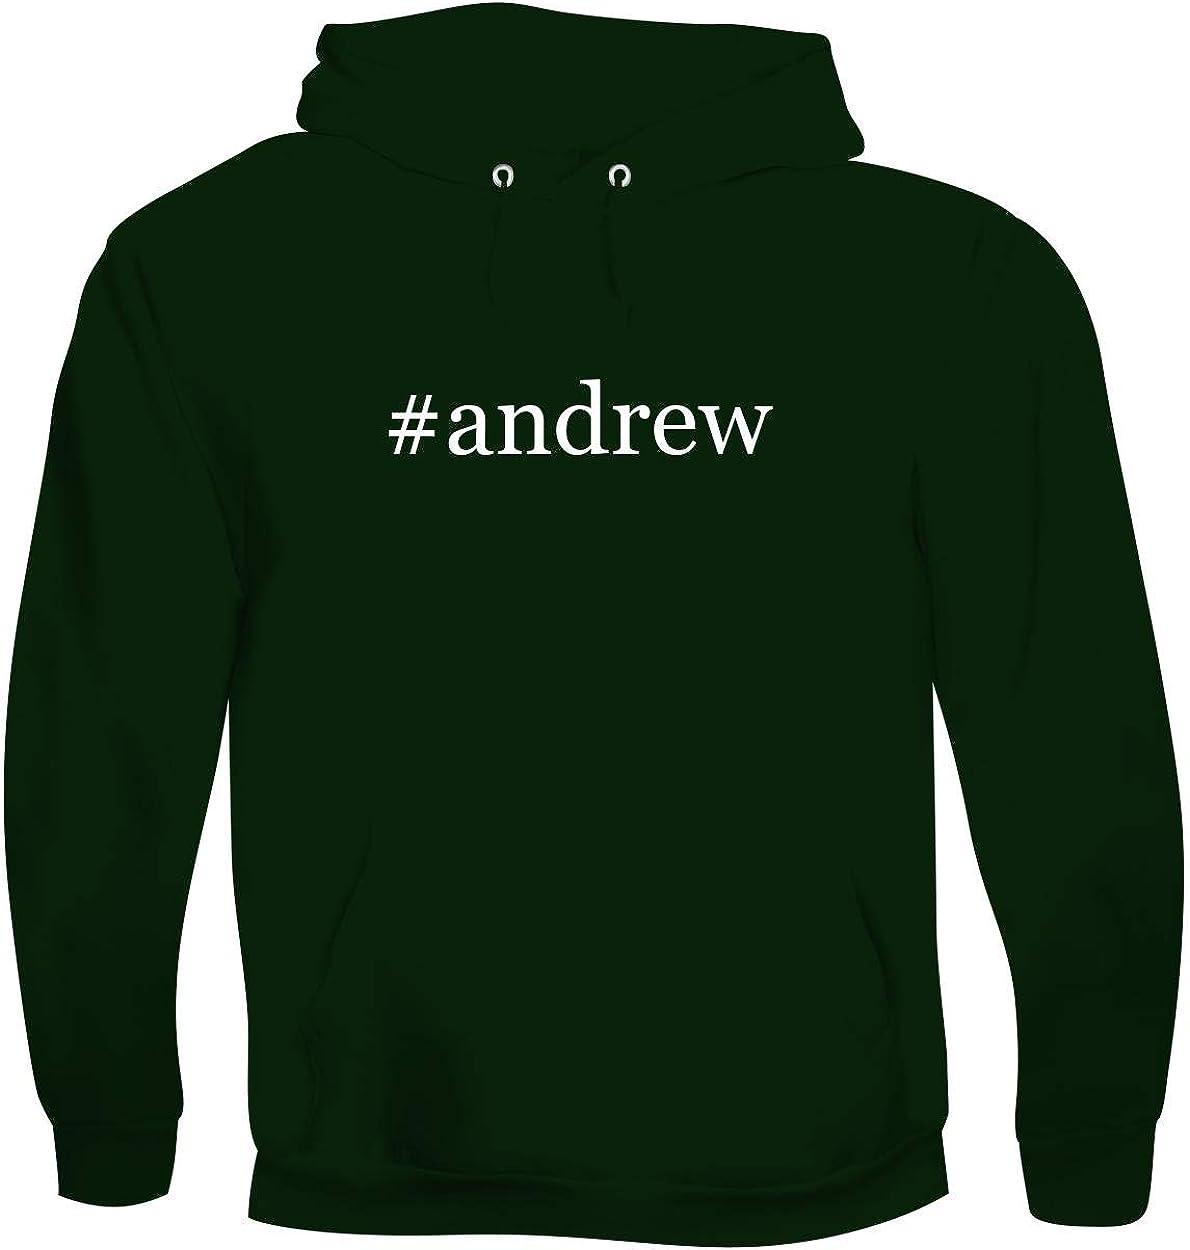 #andrew - Men's Hashtag Soft & Comfortable Hoodie Sweatshirt Pullover 51kAND0R0RL